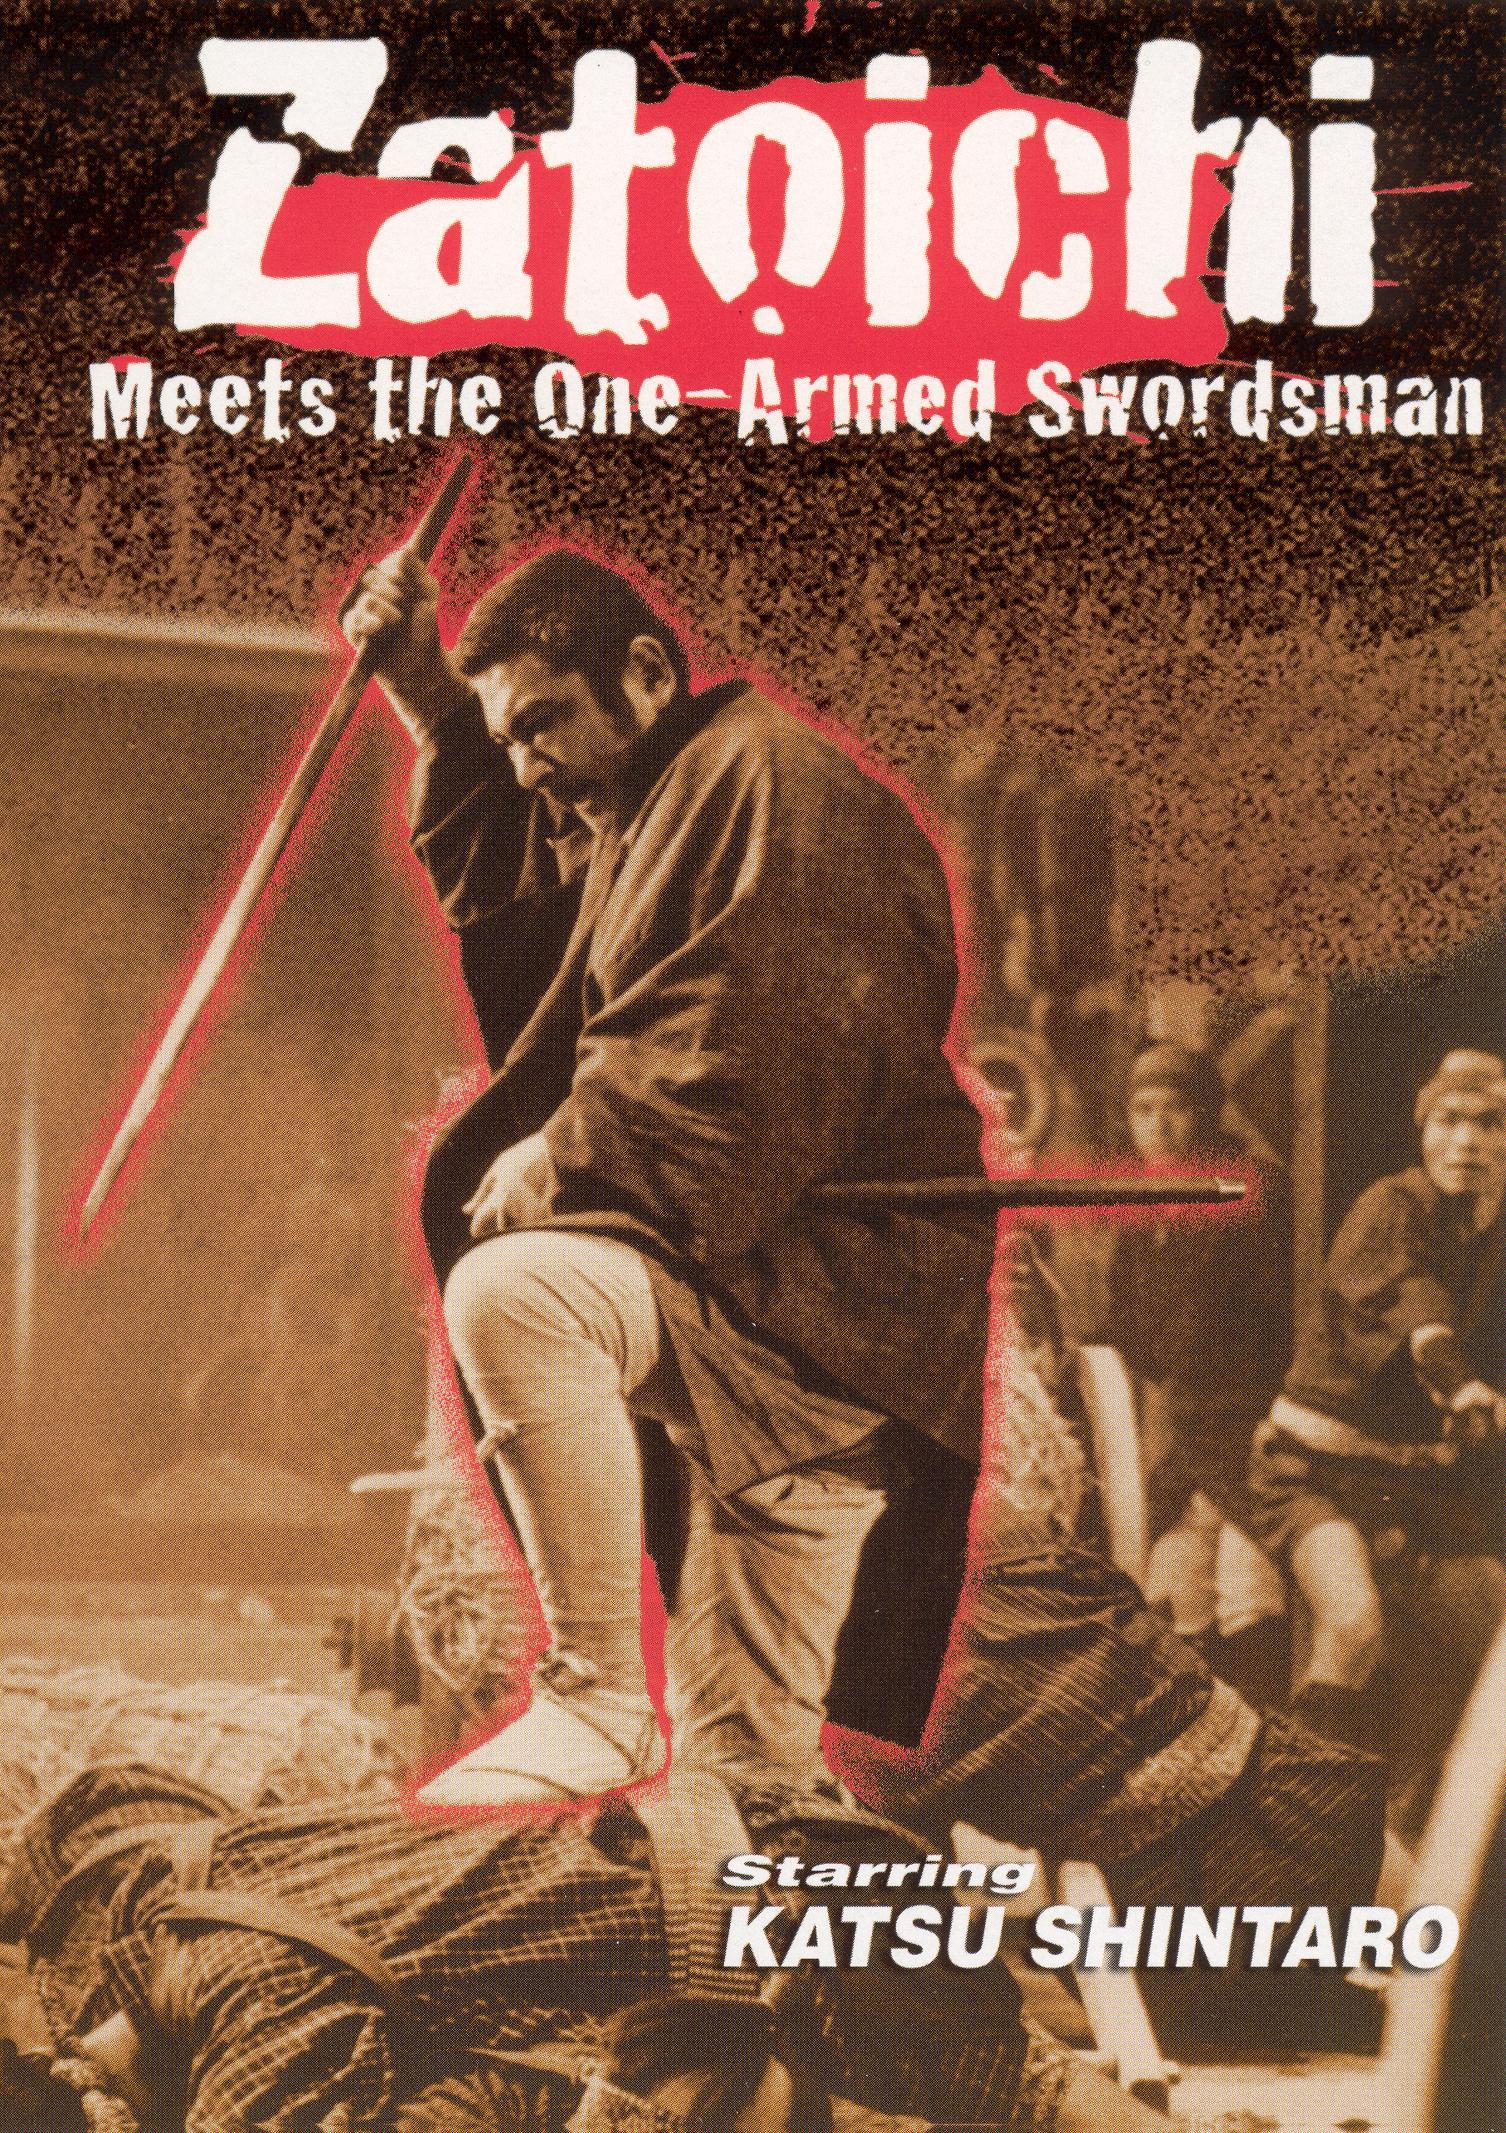 zatoichi meets the one armed swordsman download free